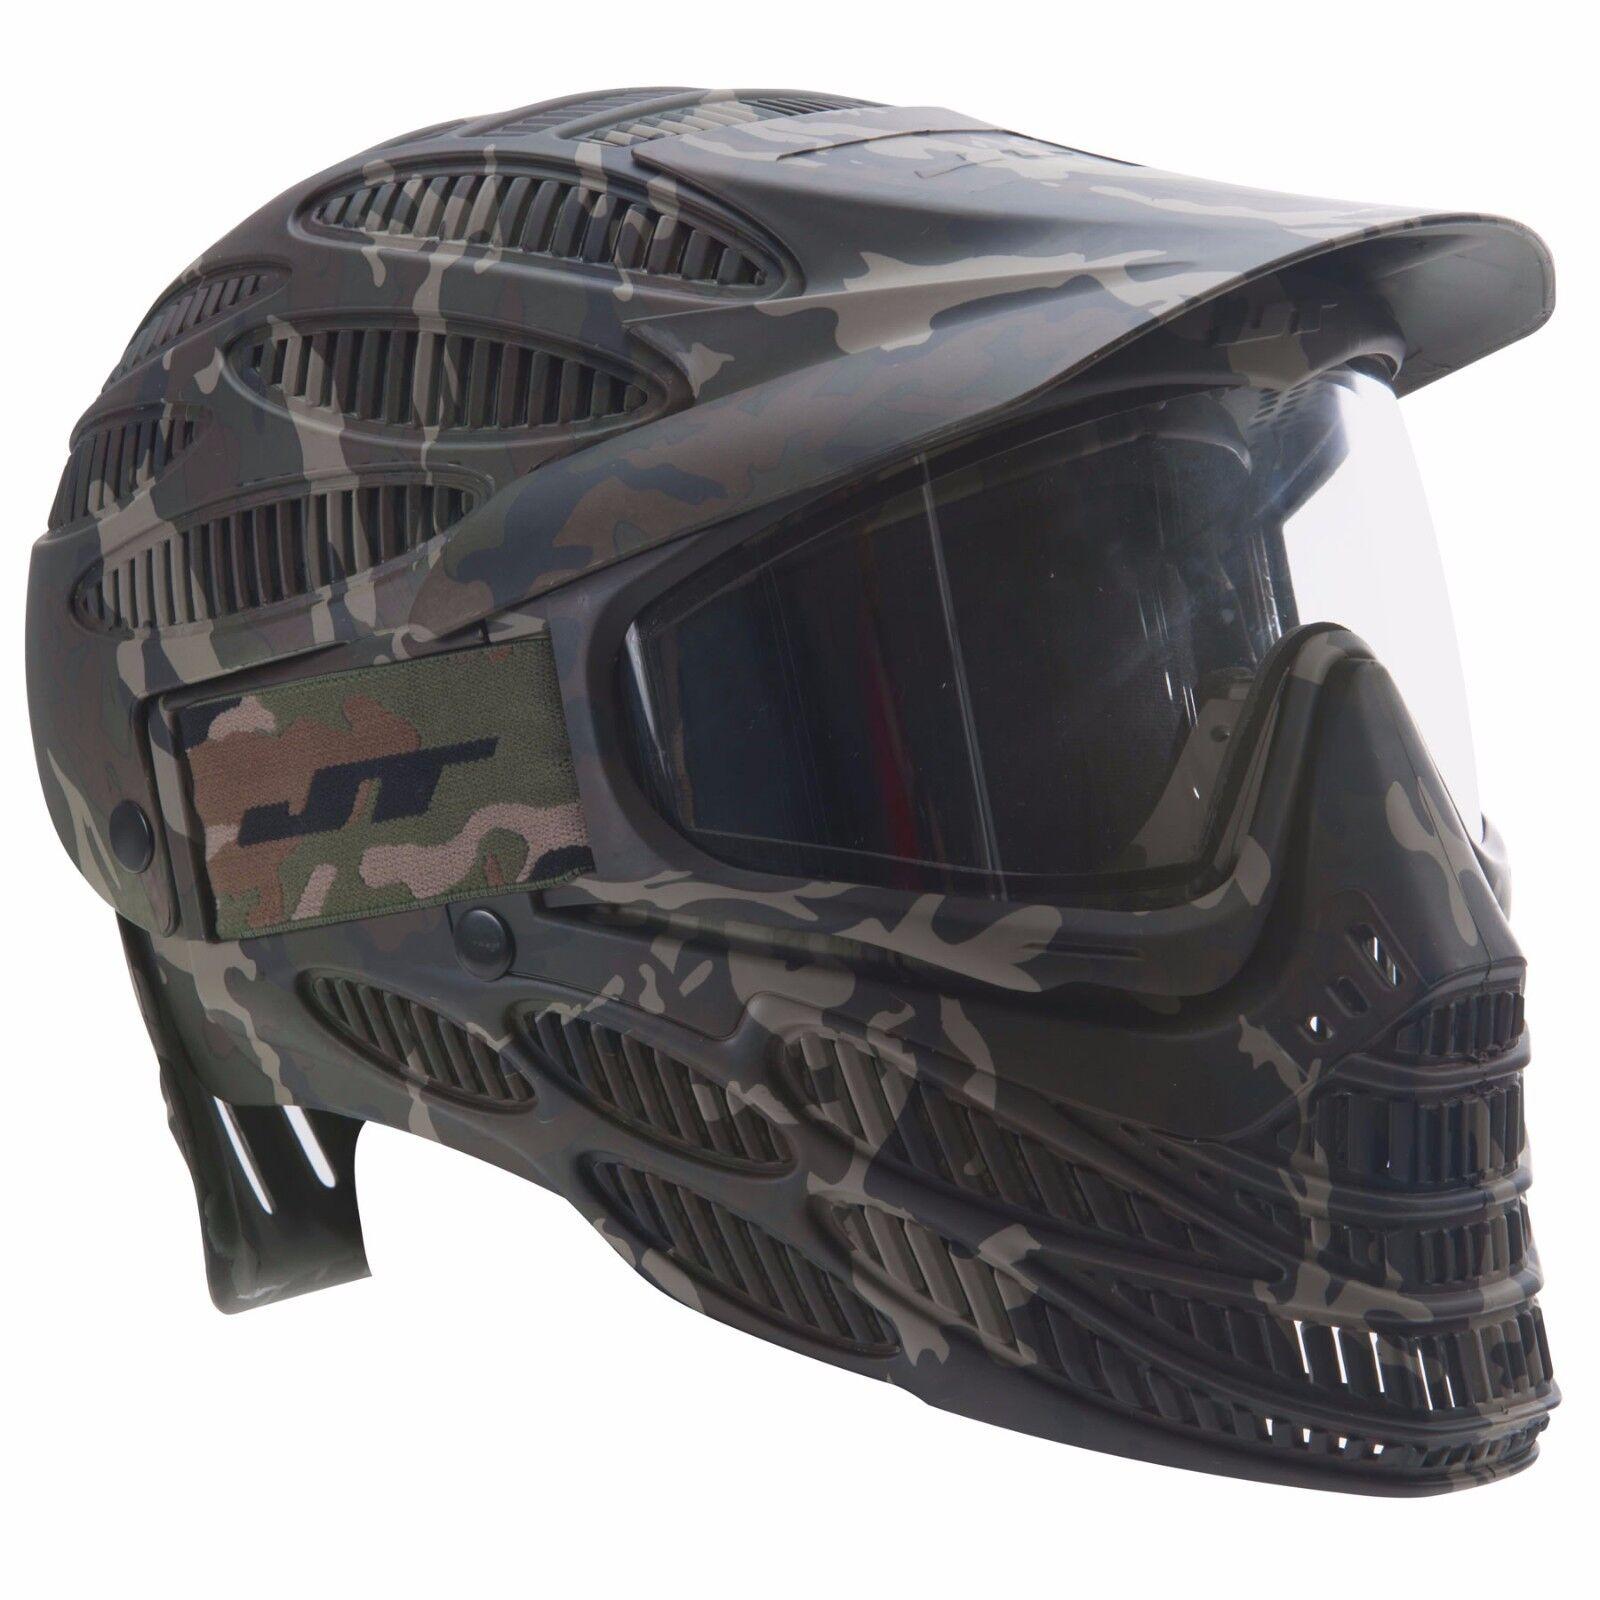 Jt Flex 8 Completa cabeza cubierta Paintball mask goggle-Térmico-Camo